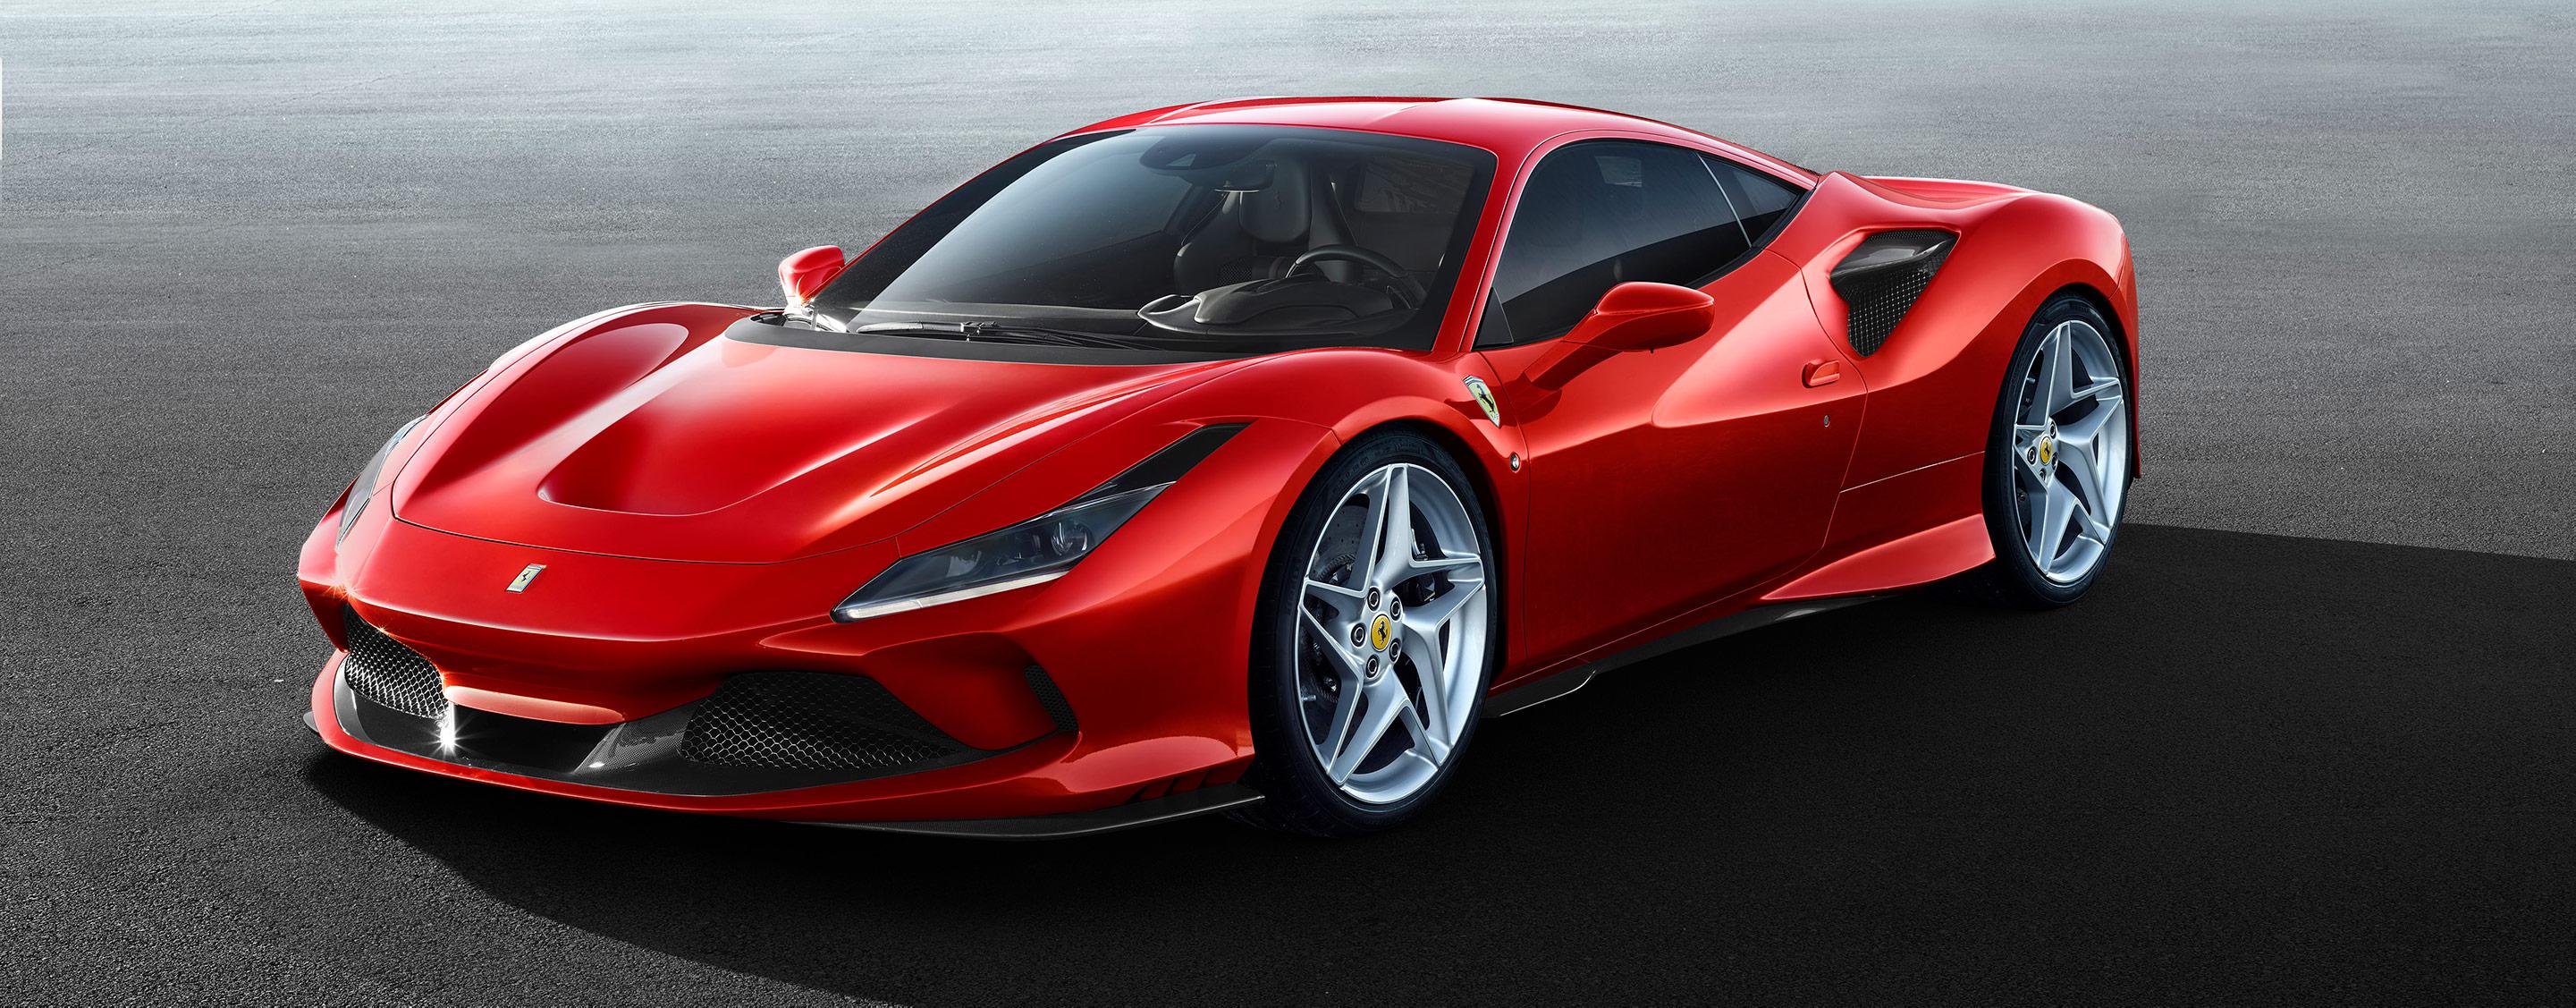 TrackWorthy - Ferrari F8 Tributo (1)